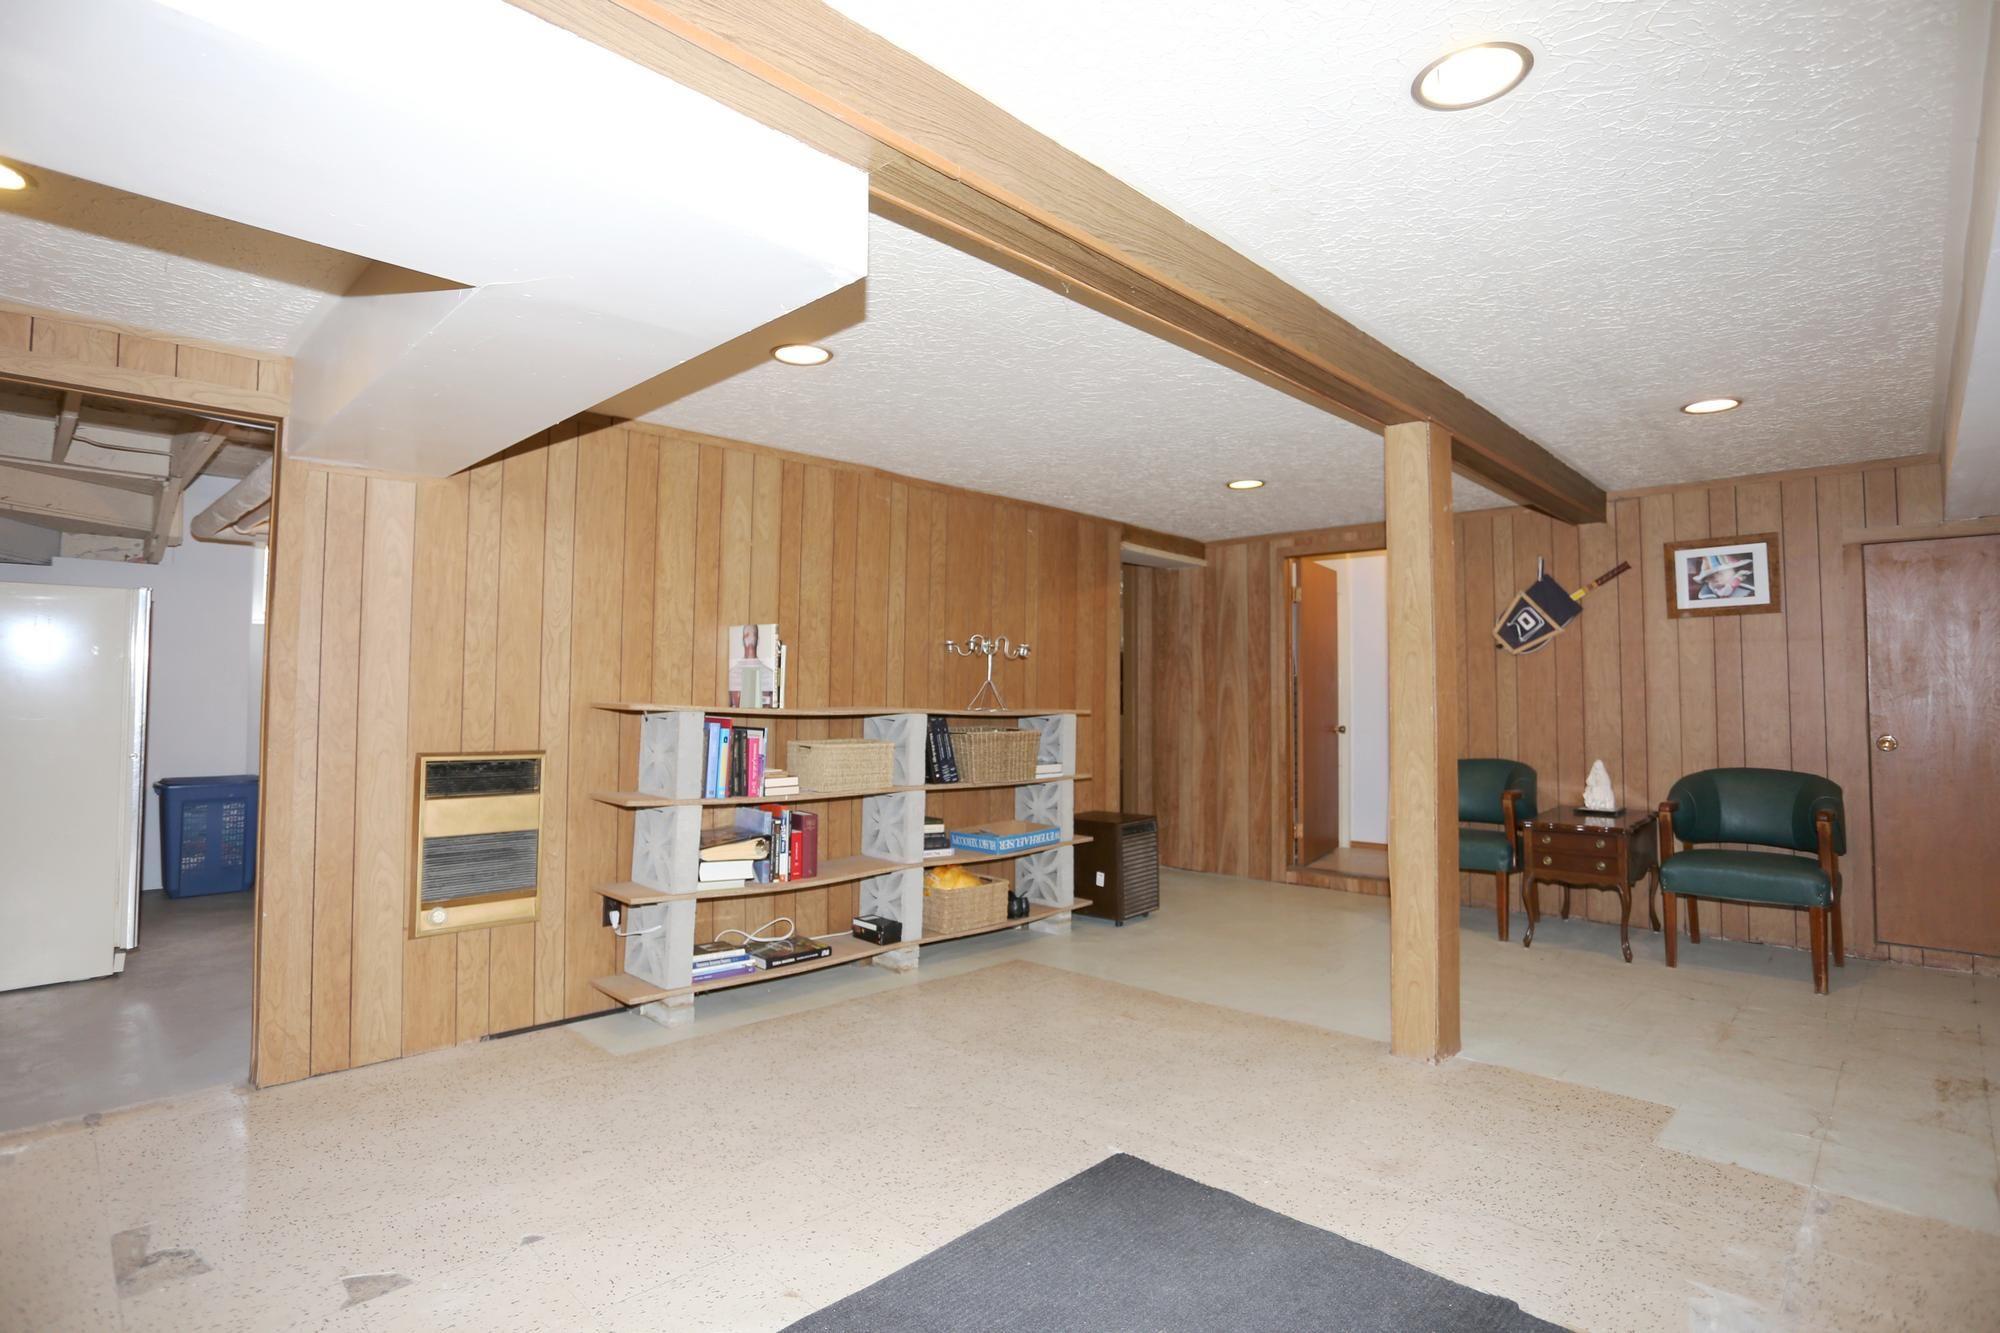 Photo 24: Photos: 109 Garfield Street South in Winnipeg: Wolseley Single Family Detached for sale (5B)  : MLS®# 1808340